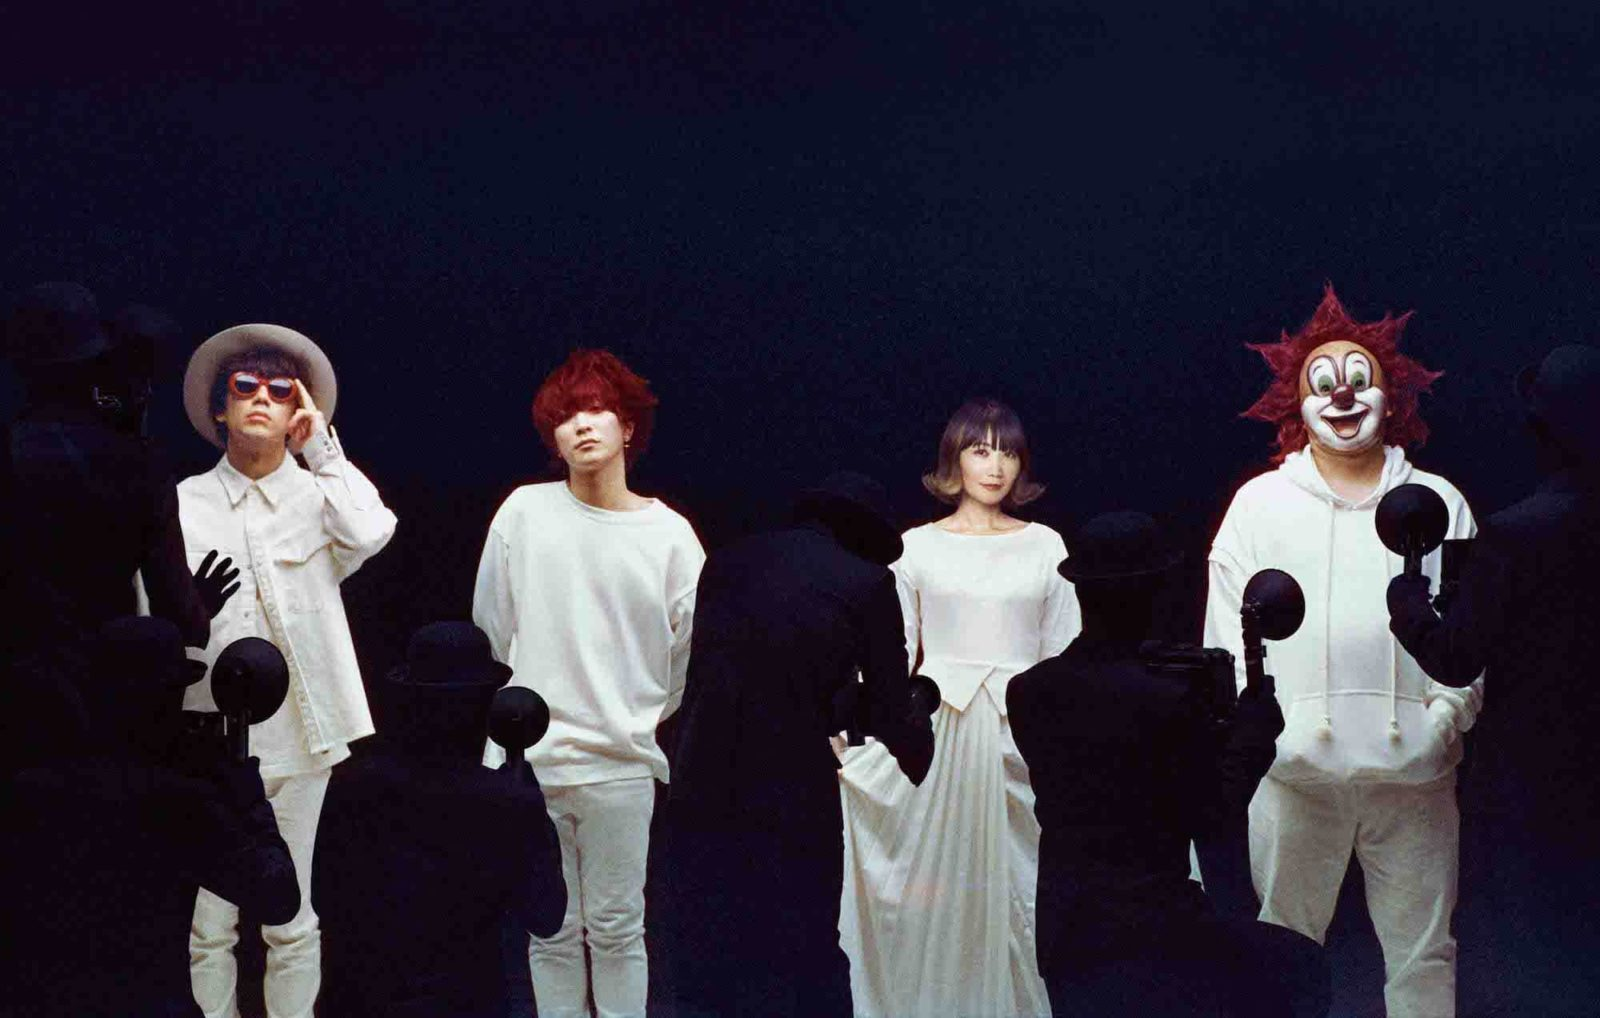 SEKAI NO OWARI「Eye」「Lip」新アーティスト写真&全収録楽曲発表サムネイル画像